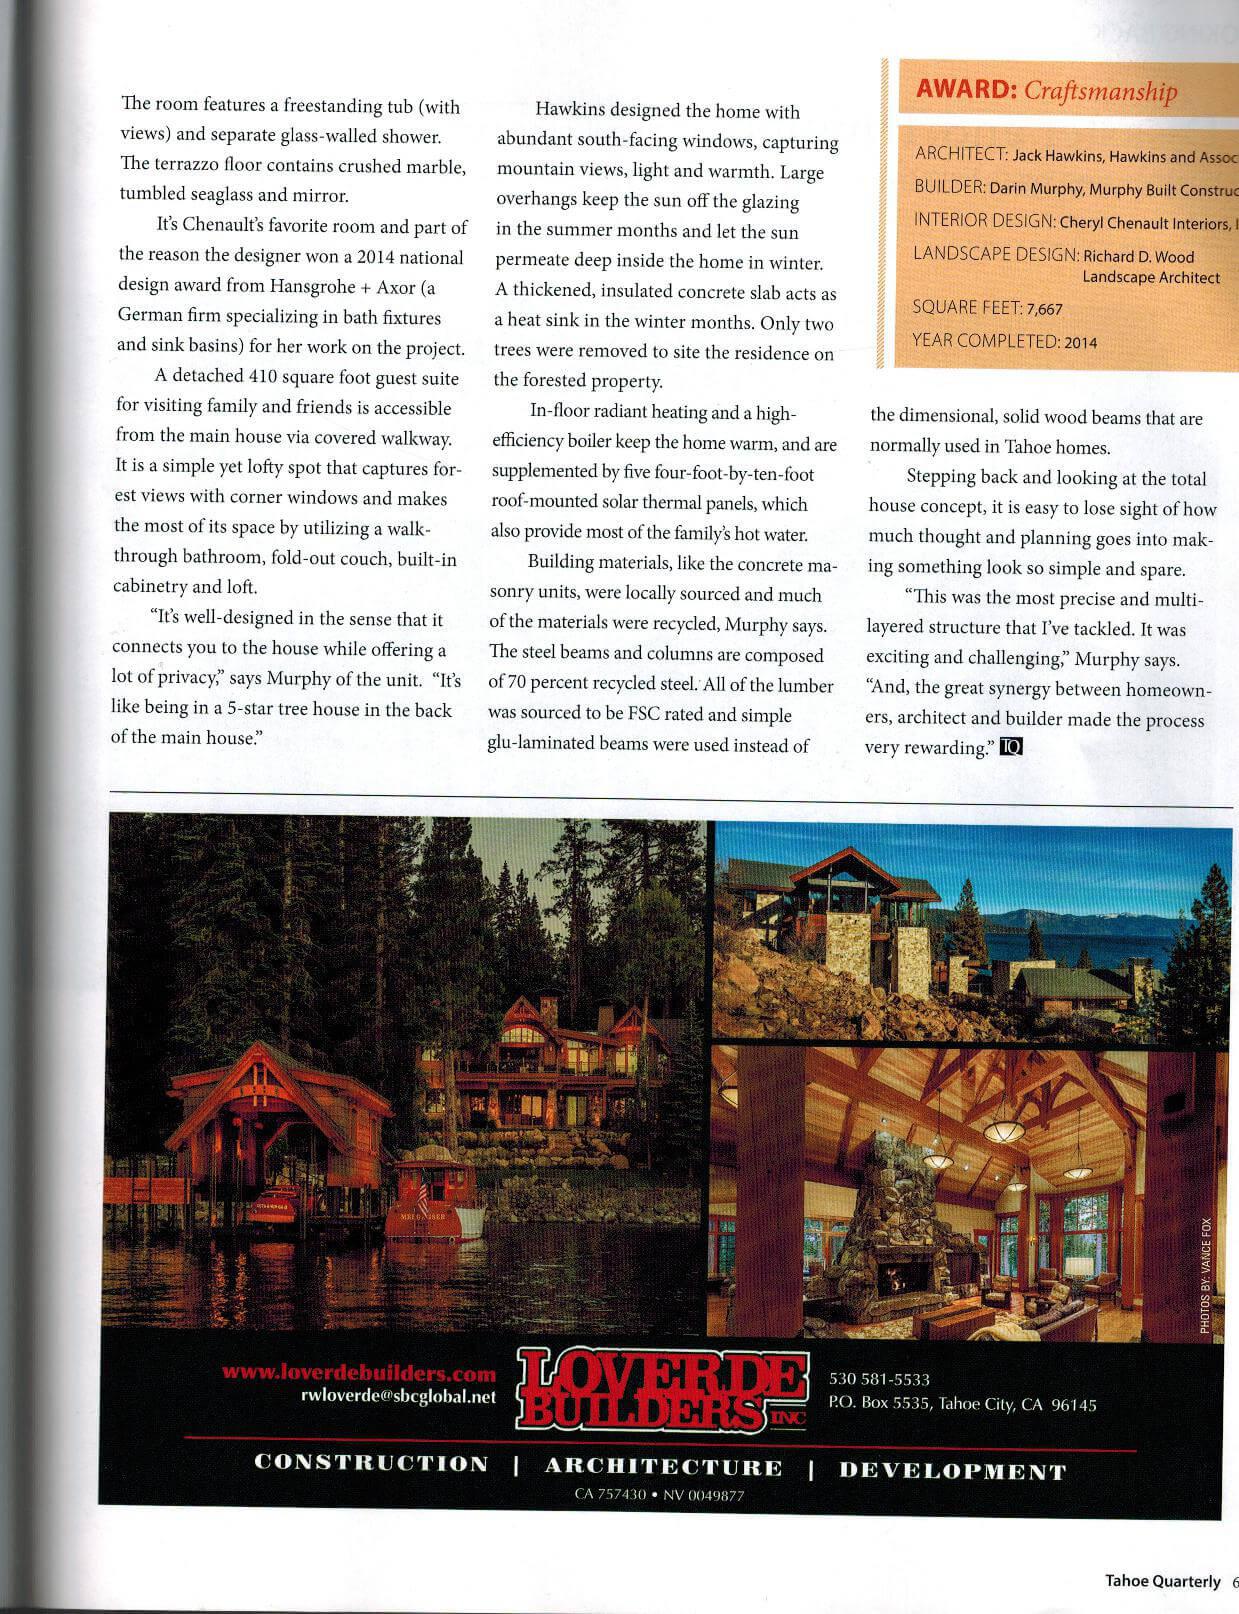 Tahoe Quarterly 2015 Bancroft0005